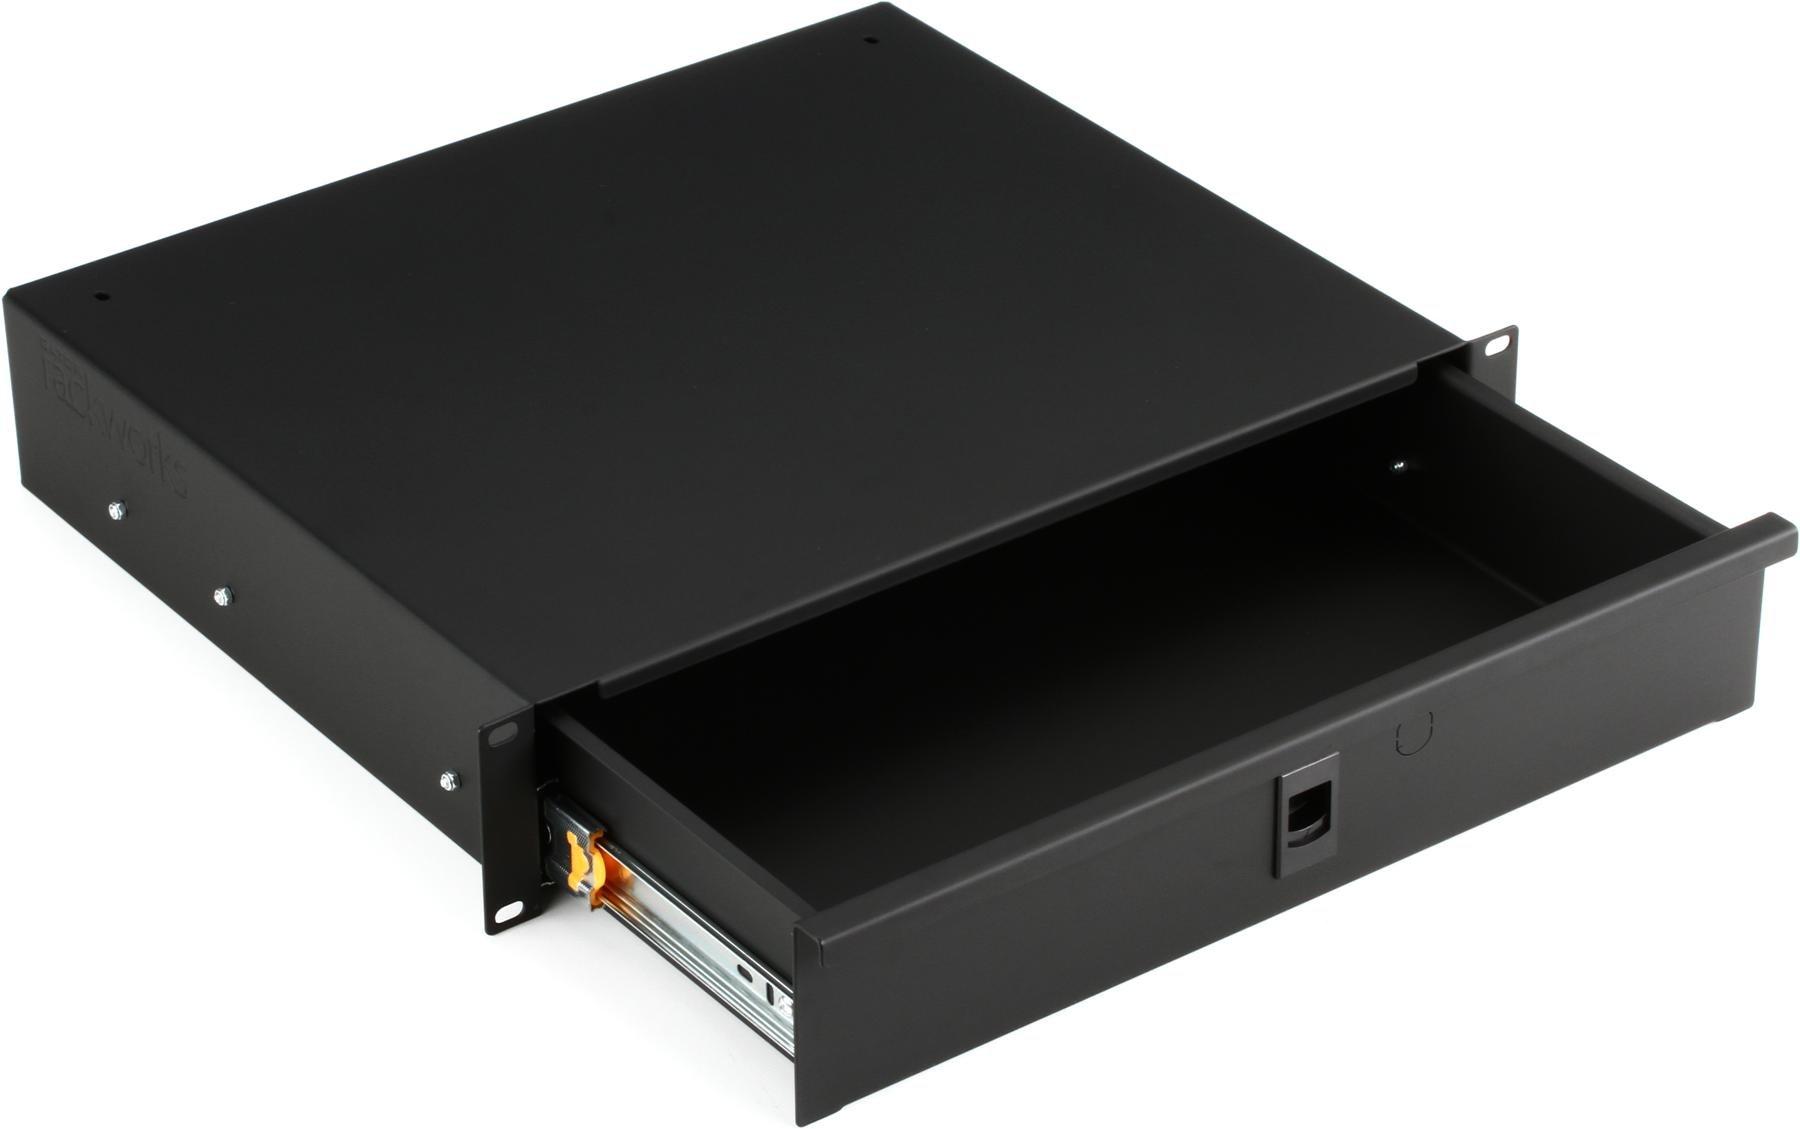 Gator GRW-DRW2 - Standard Rack Drawer - 2U